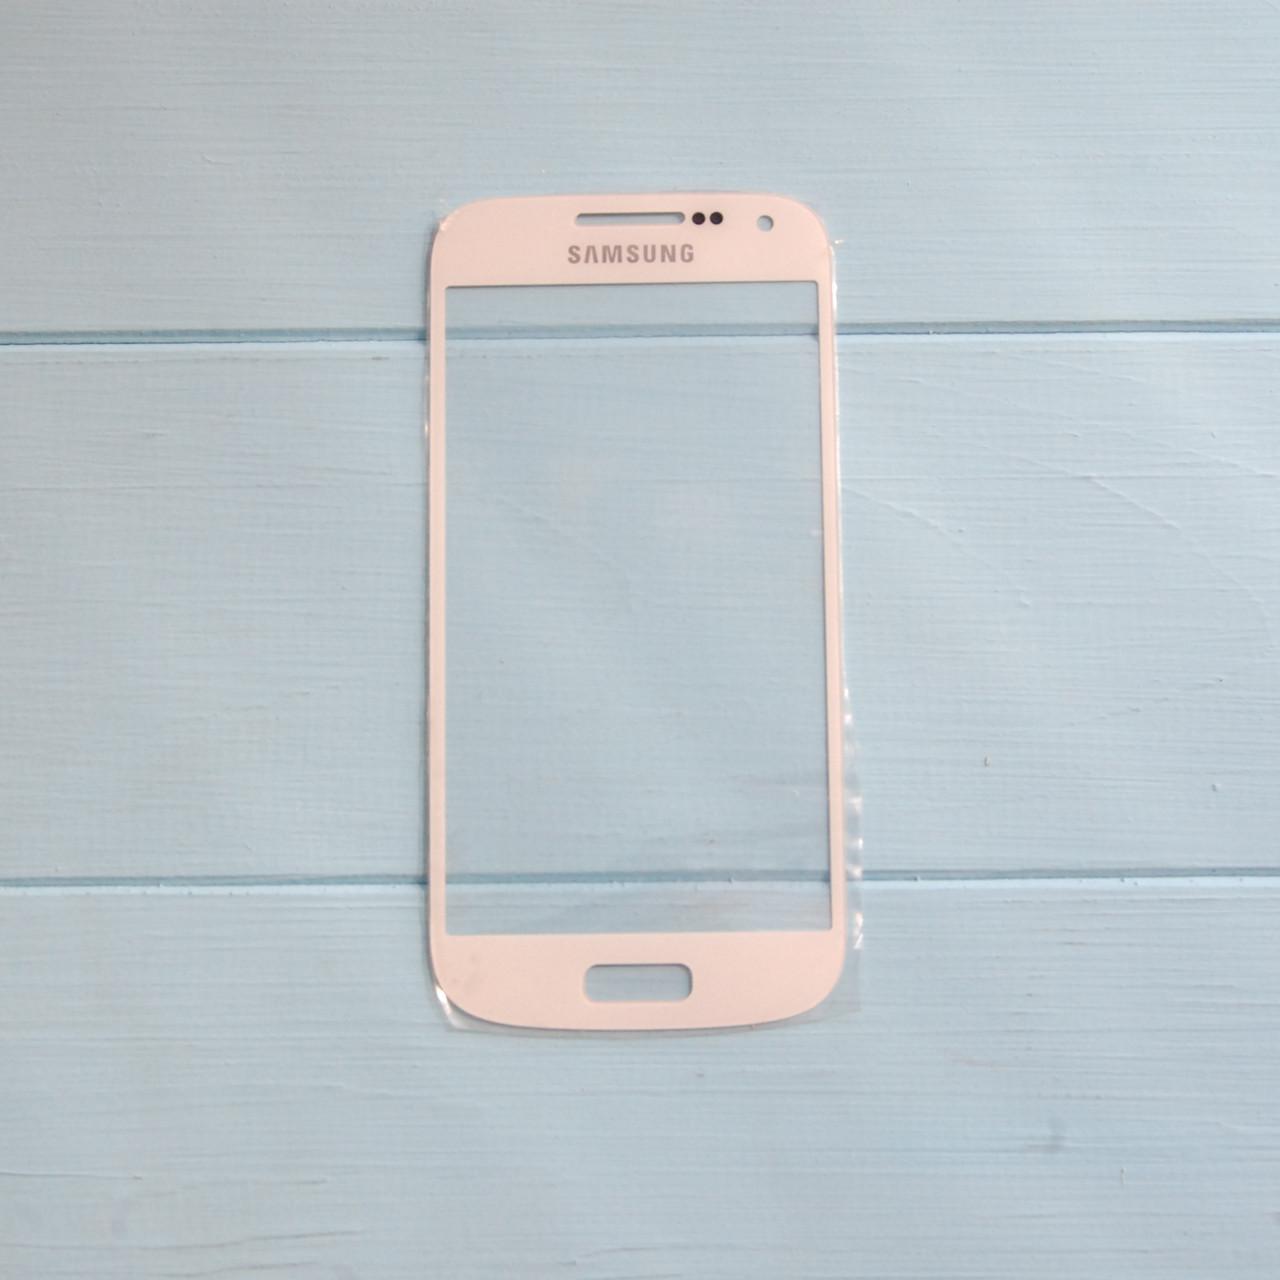 Стекло корпуса для Samsung I9190 Galaxy S4 mini, I9192 Galaxy S4 Mini Duos, I9195 Galaxy S4 mini white